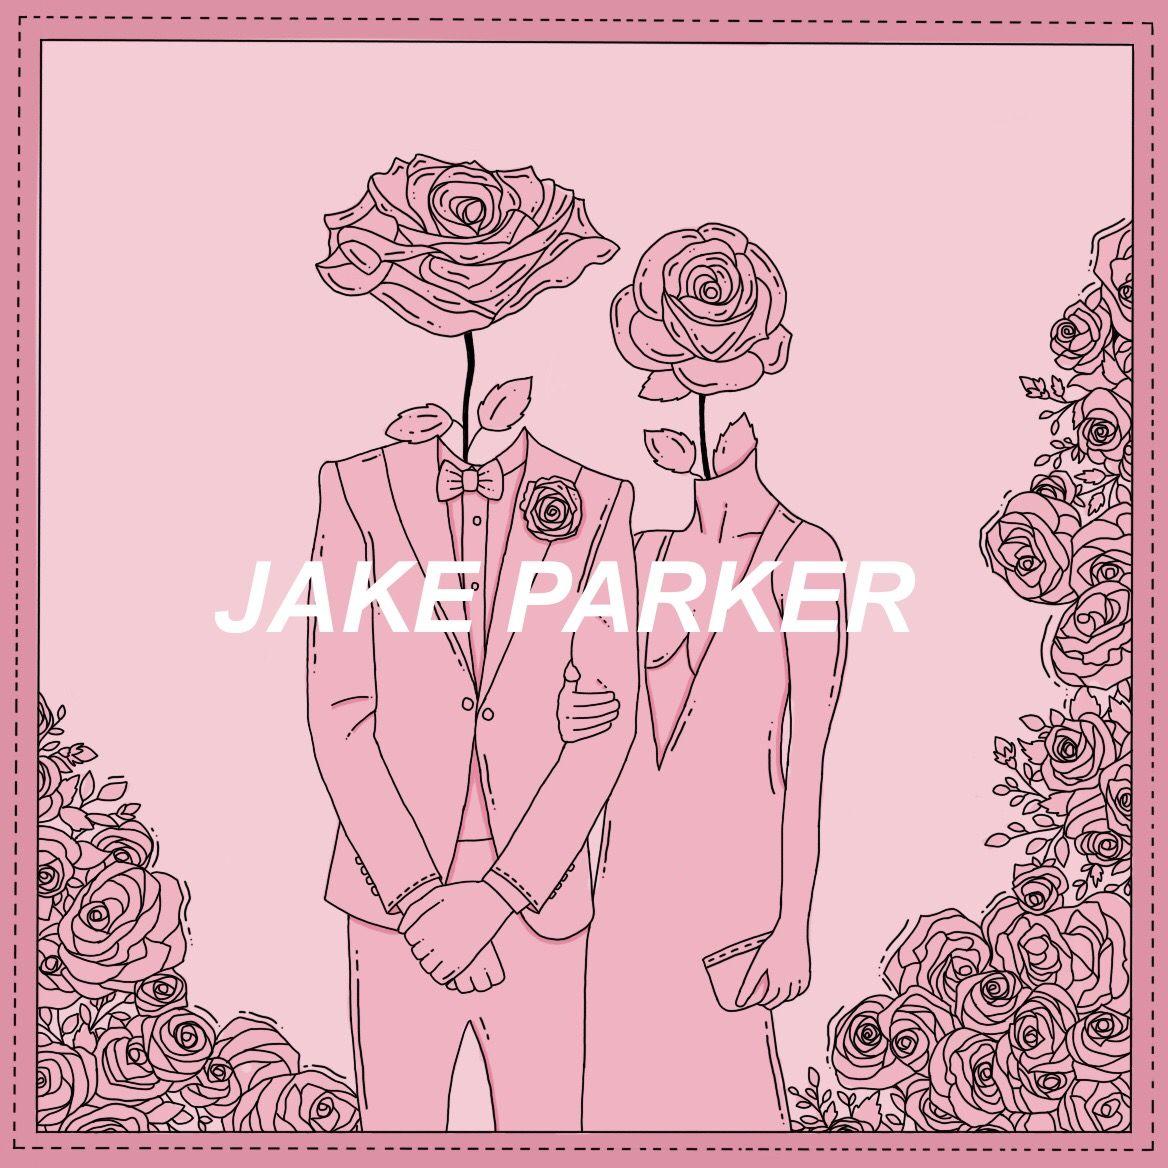 Jake Parker Shop | Redbubble